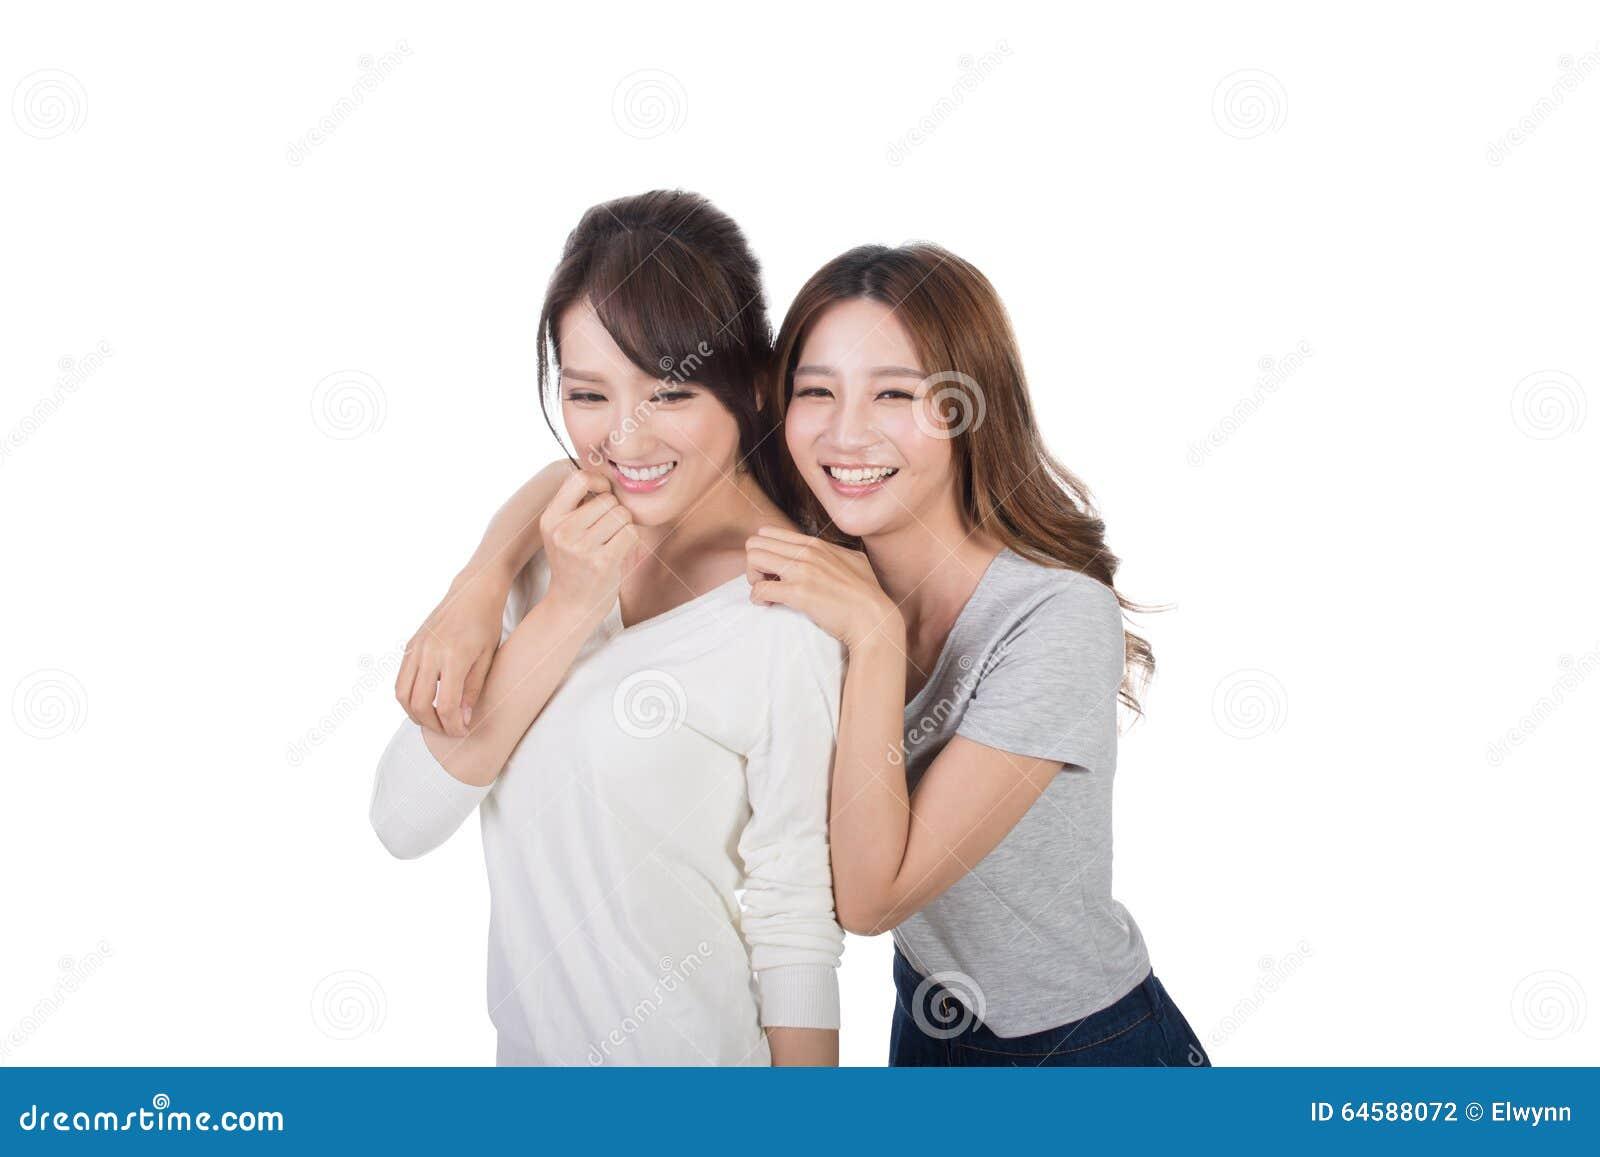 Asia adult friend